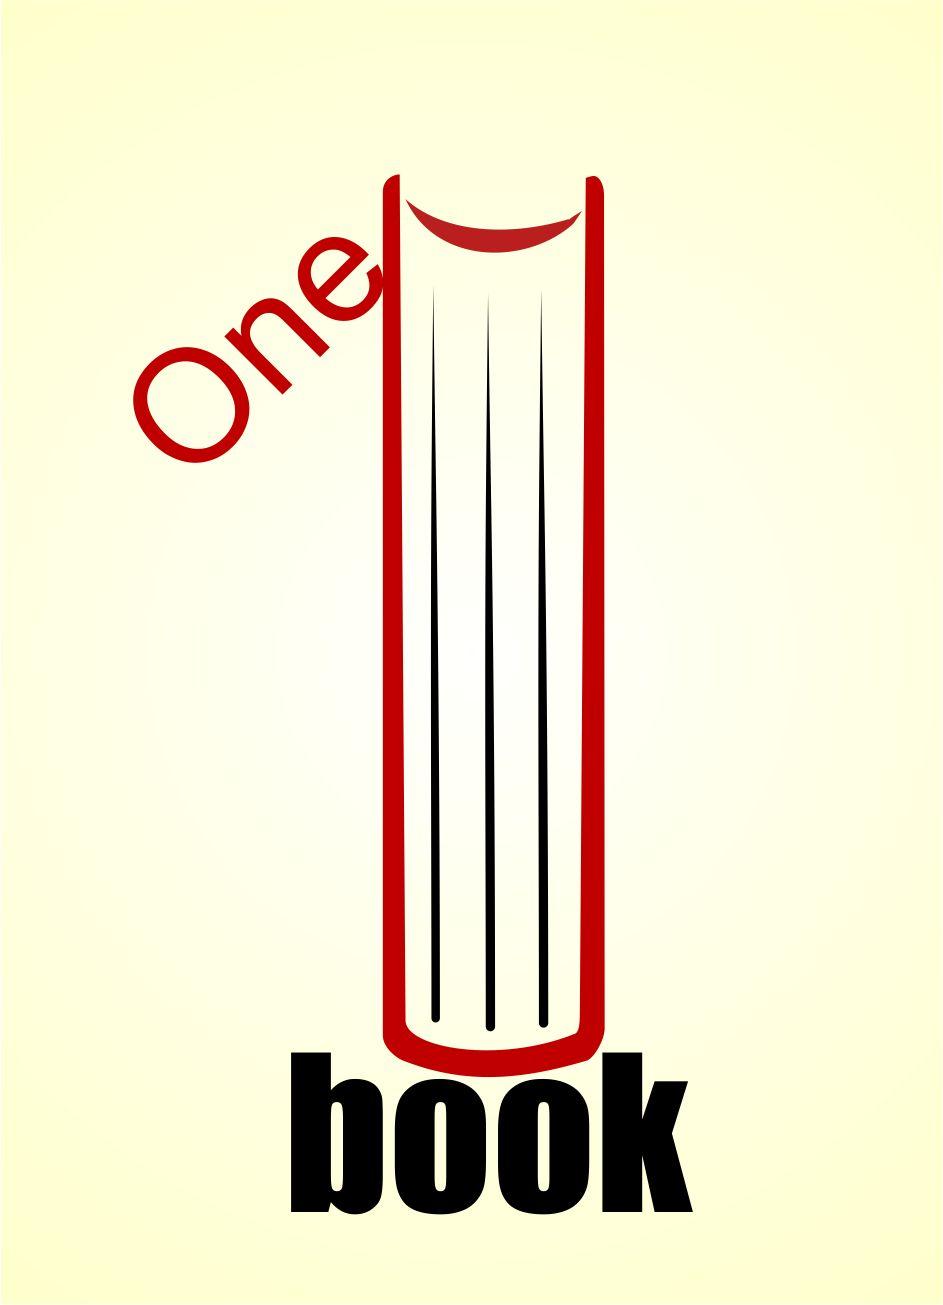 Логотип для цифровой книжной типографии. фото f_4cc153b3093a3.jpg